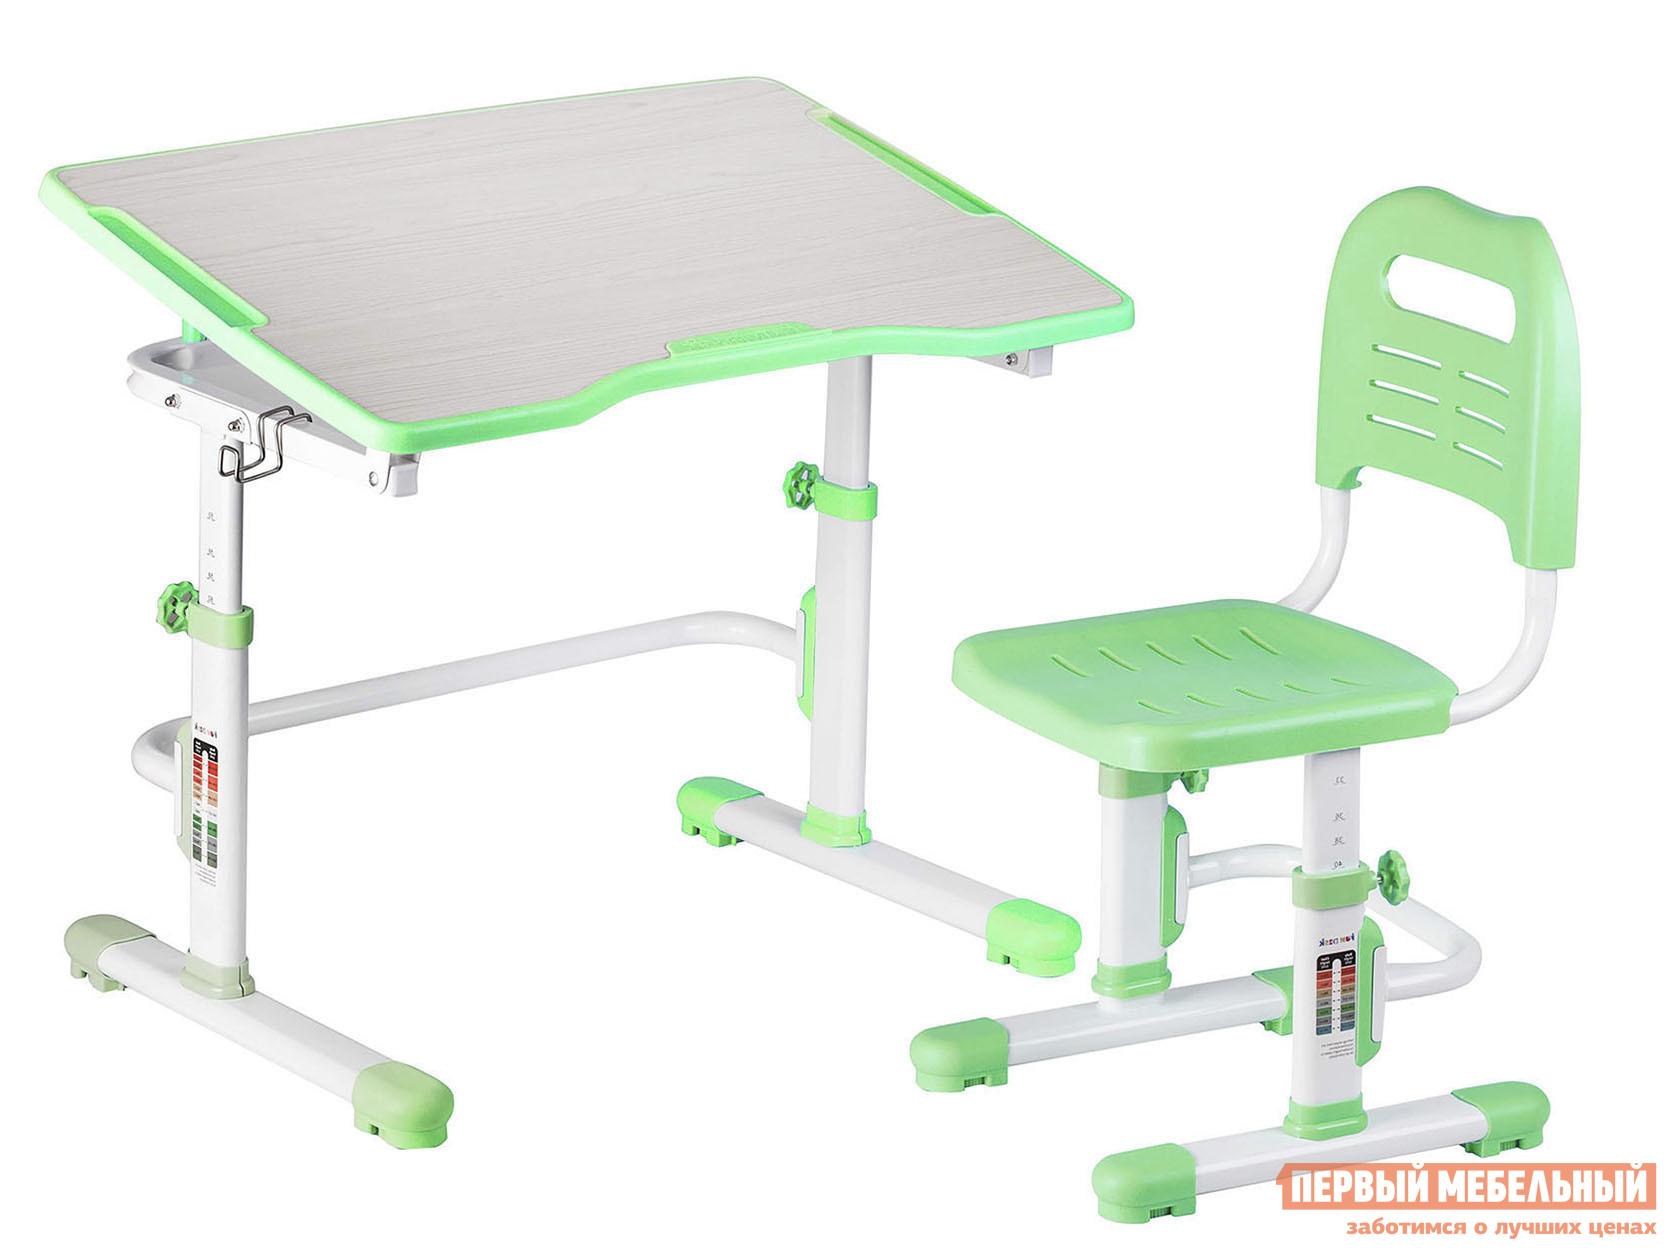 Парта  Vivo 2 Green (зеленый) — Vivo 2 Green (зеленый)